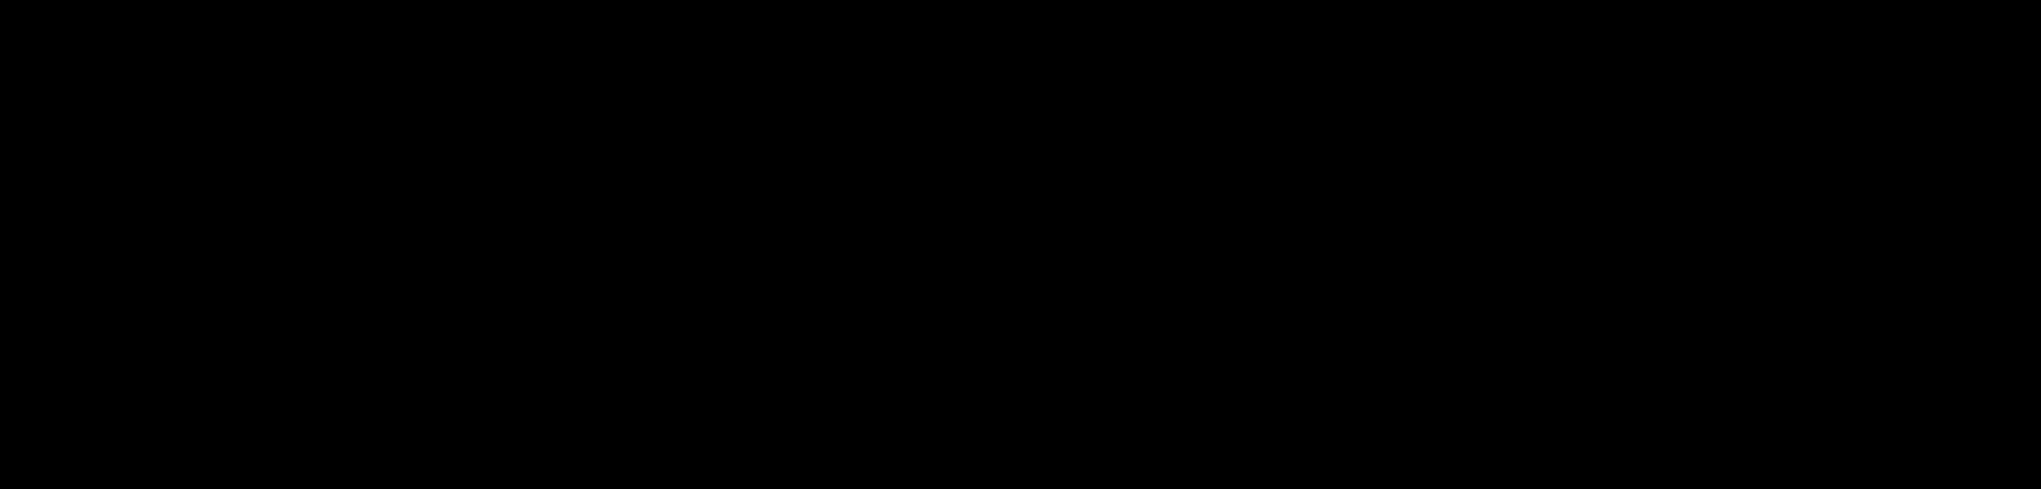 Caley Dimmock logo